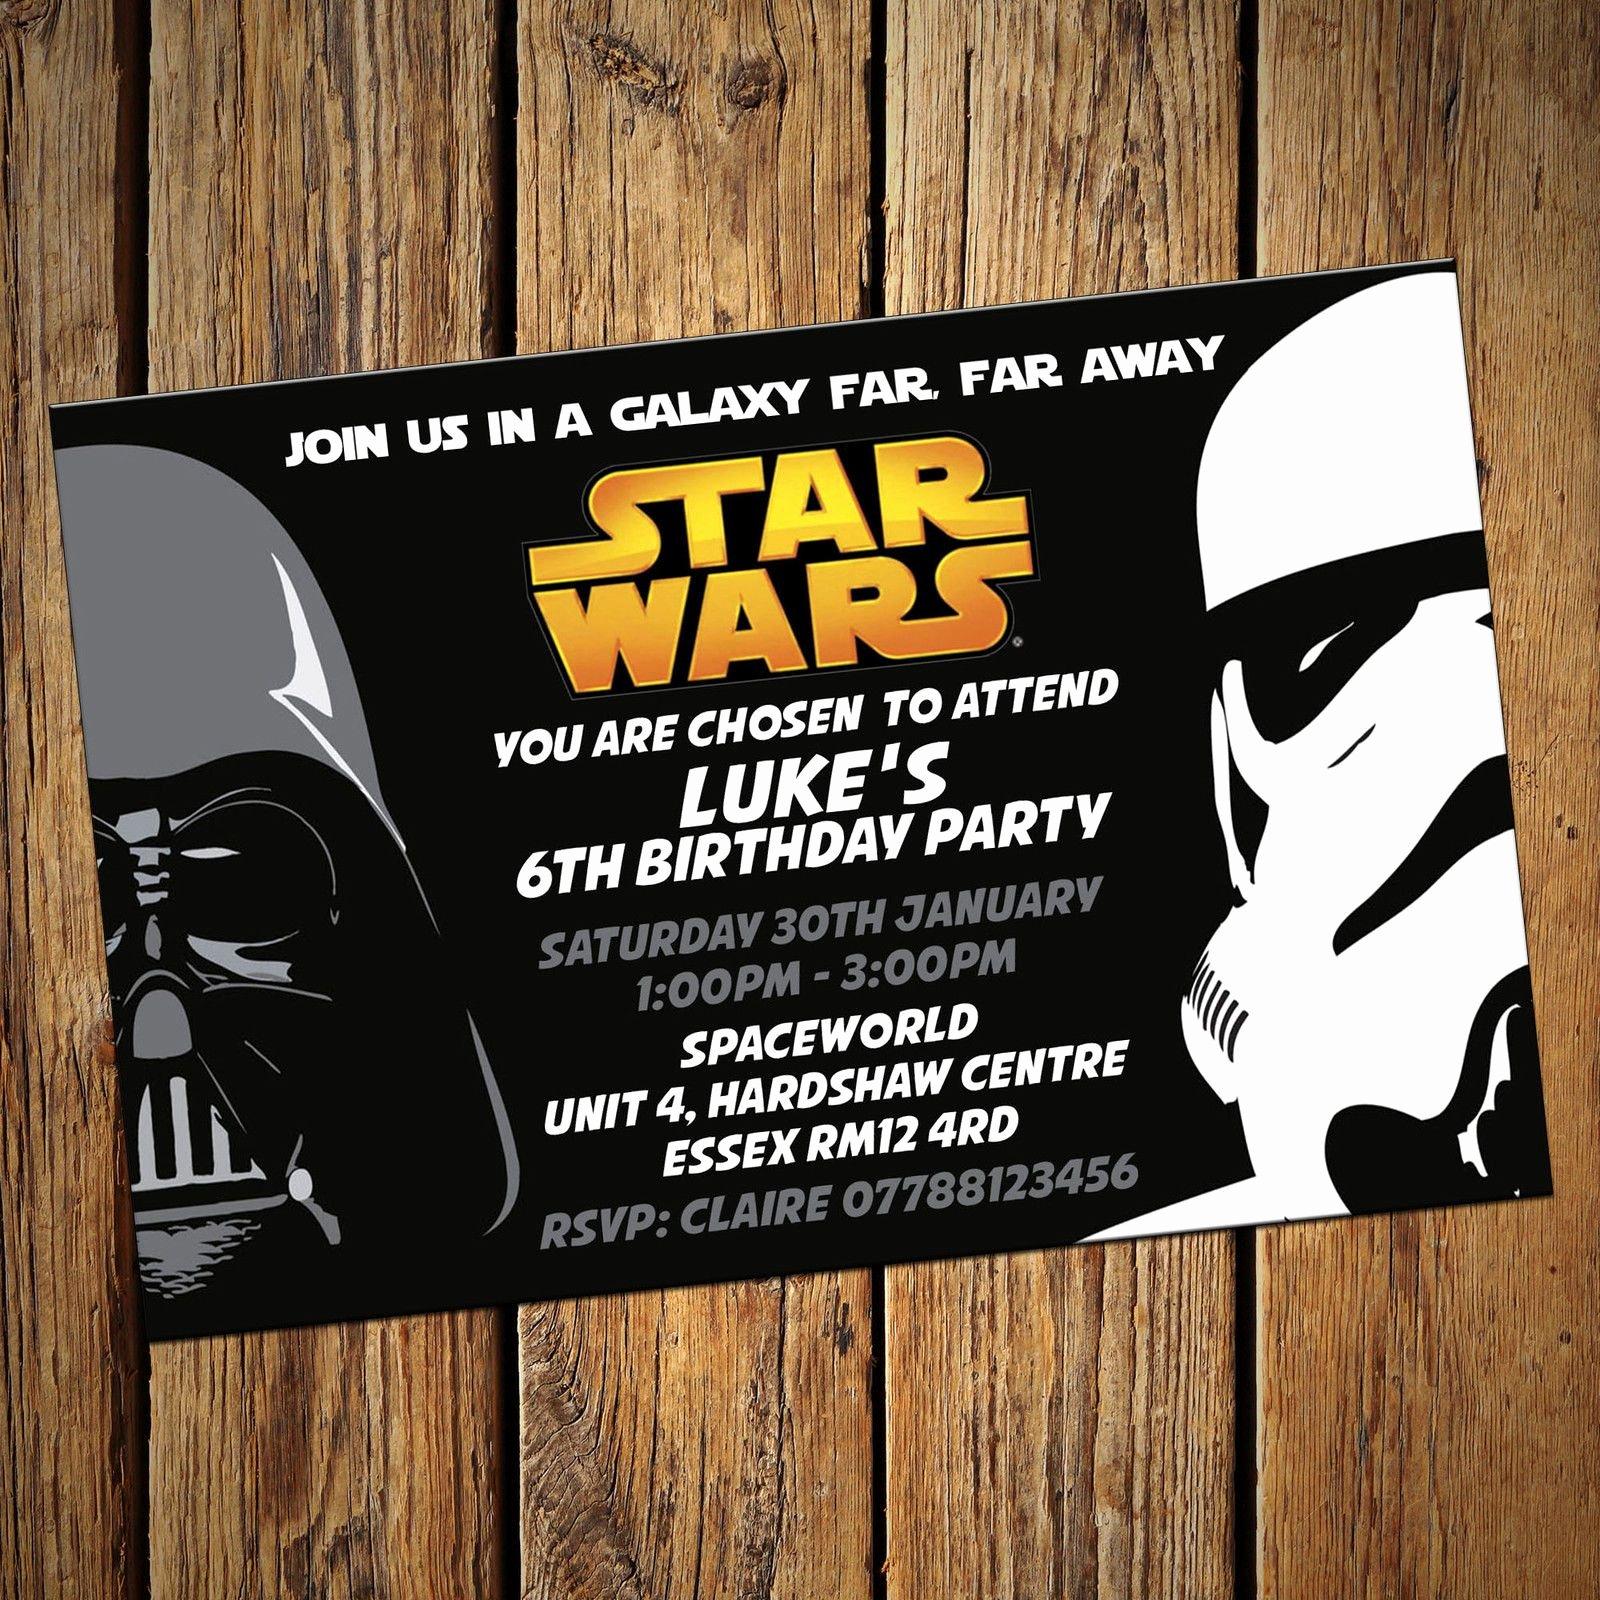 Star Wars Birthday Invite Elegant Personalised Star Wars Invitations Party Invites Ics